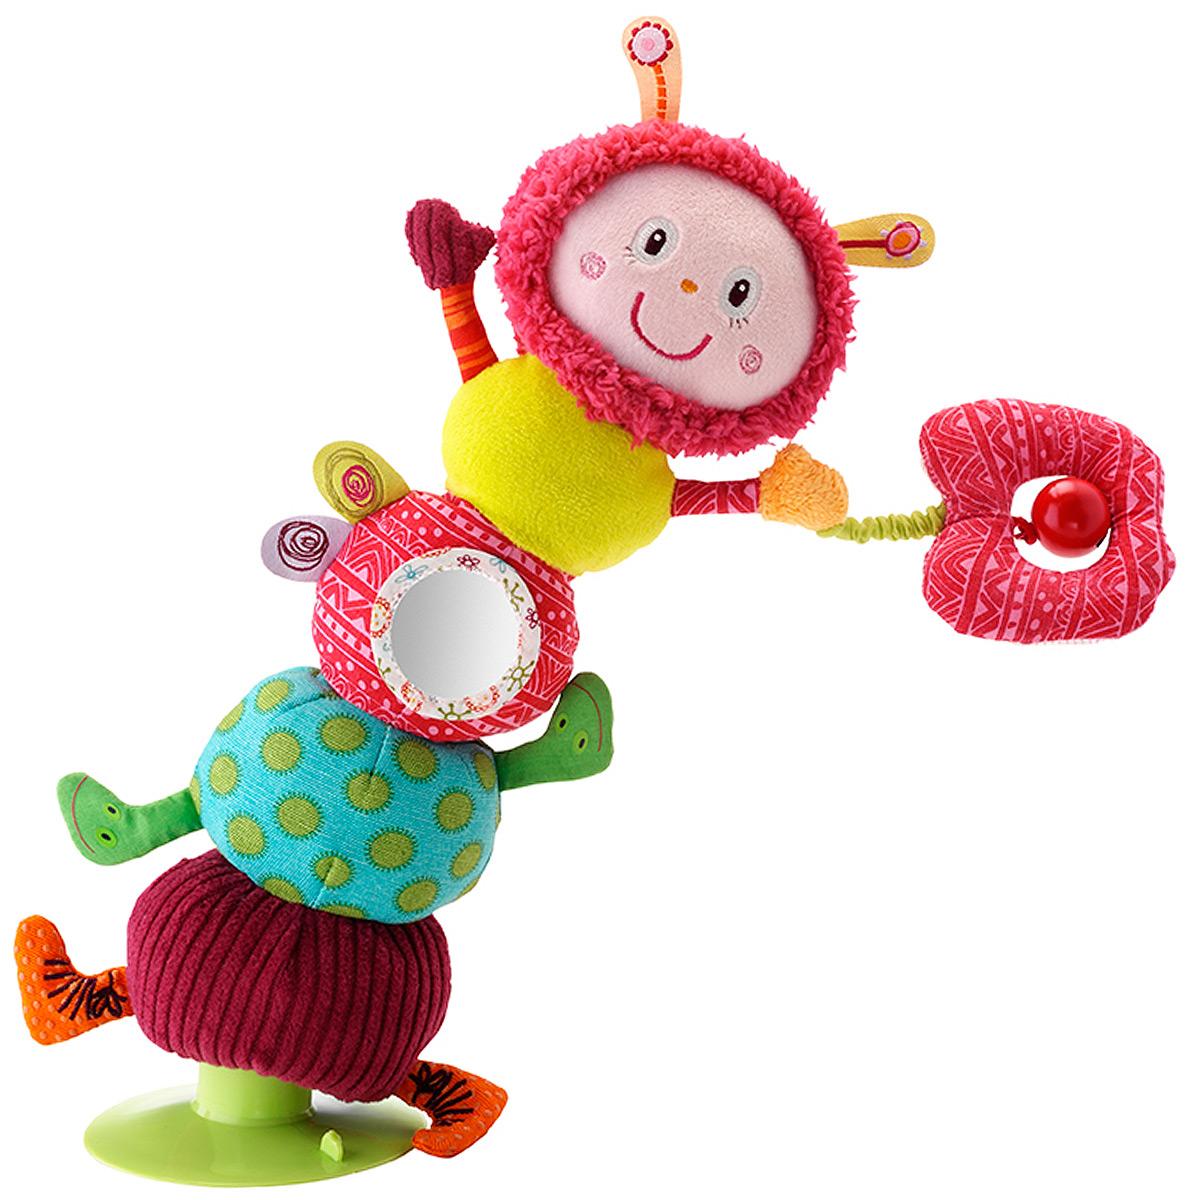 Lilliputiens Развивающая игрушка на присоске Гусеница Джульетта мягкие игрушки lilliputiens гусеница джульетта